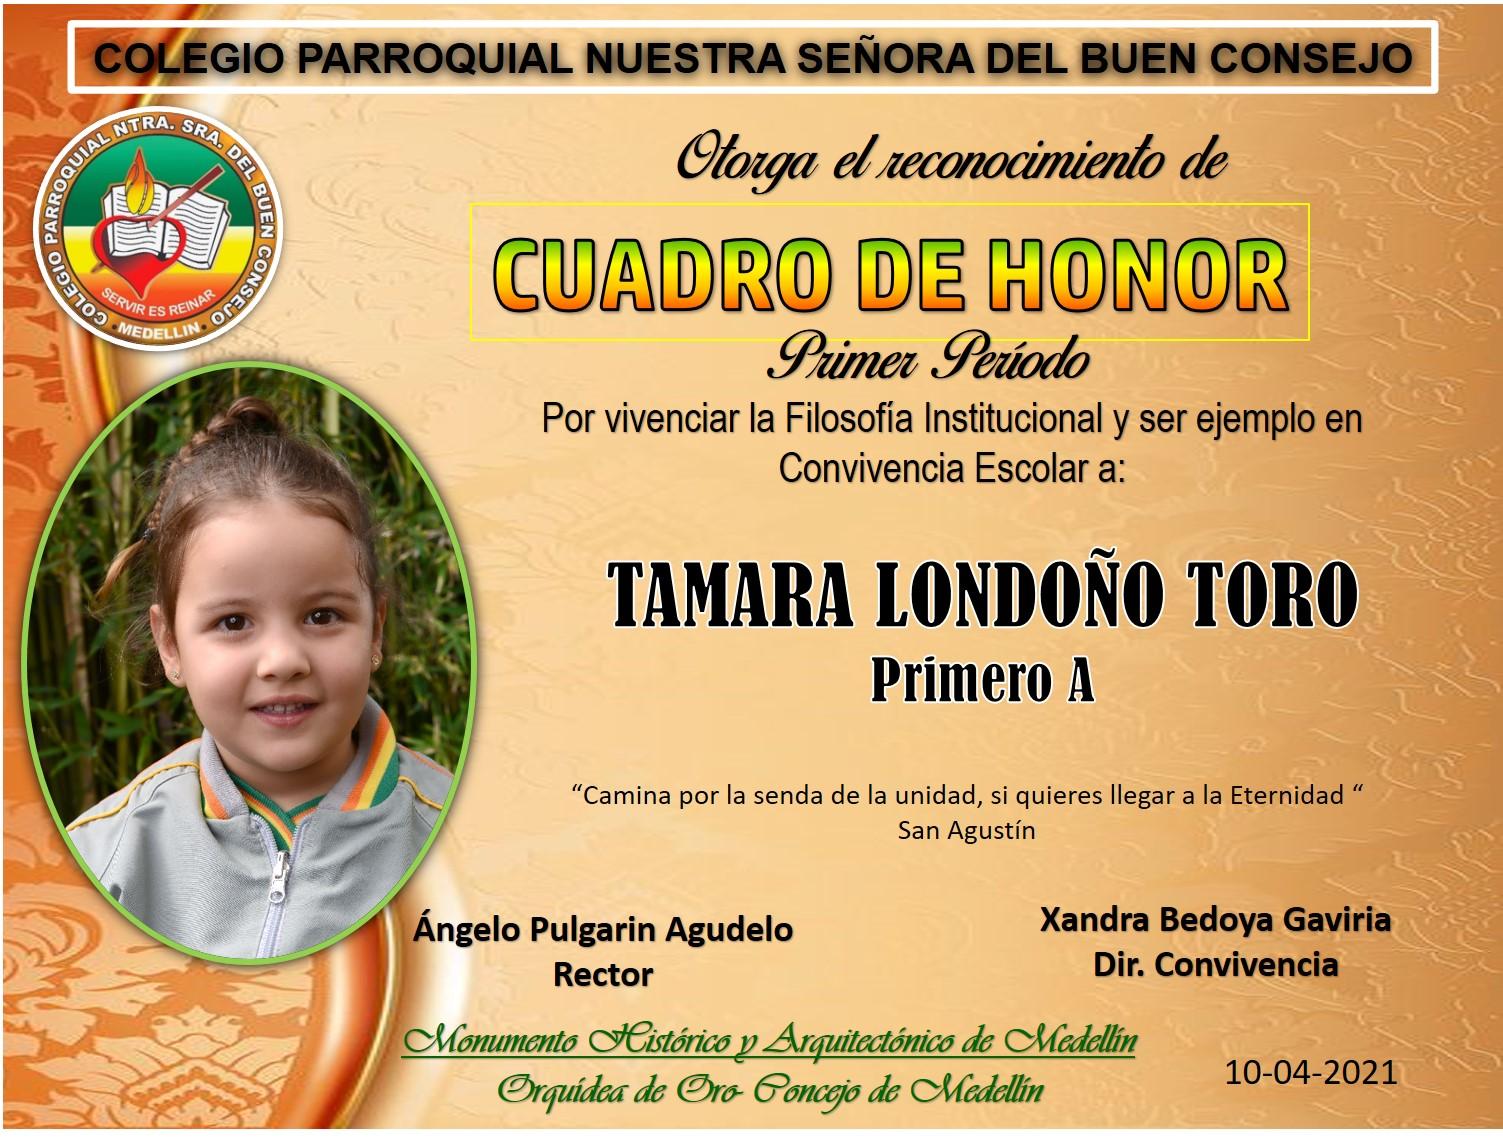 1°A TAMARA LONDOÑO TORO